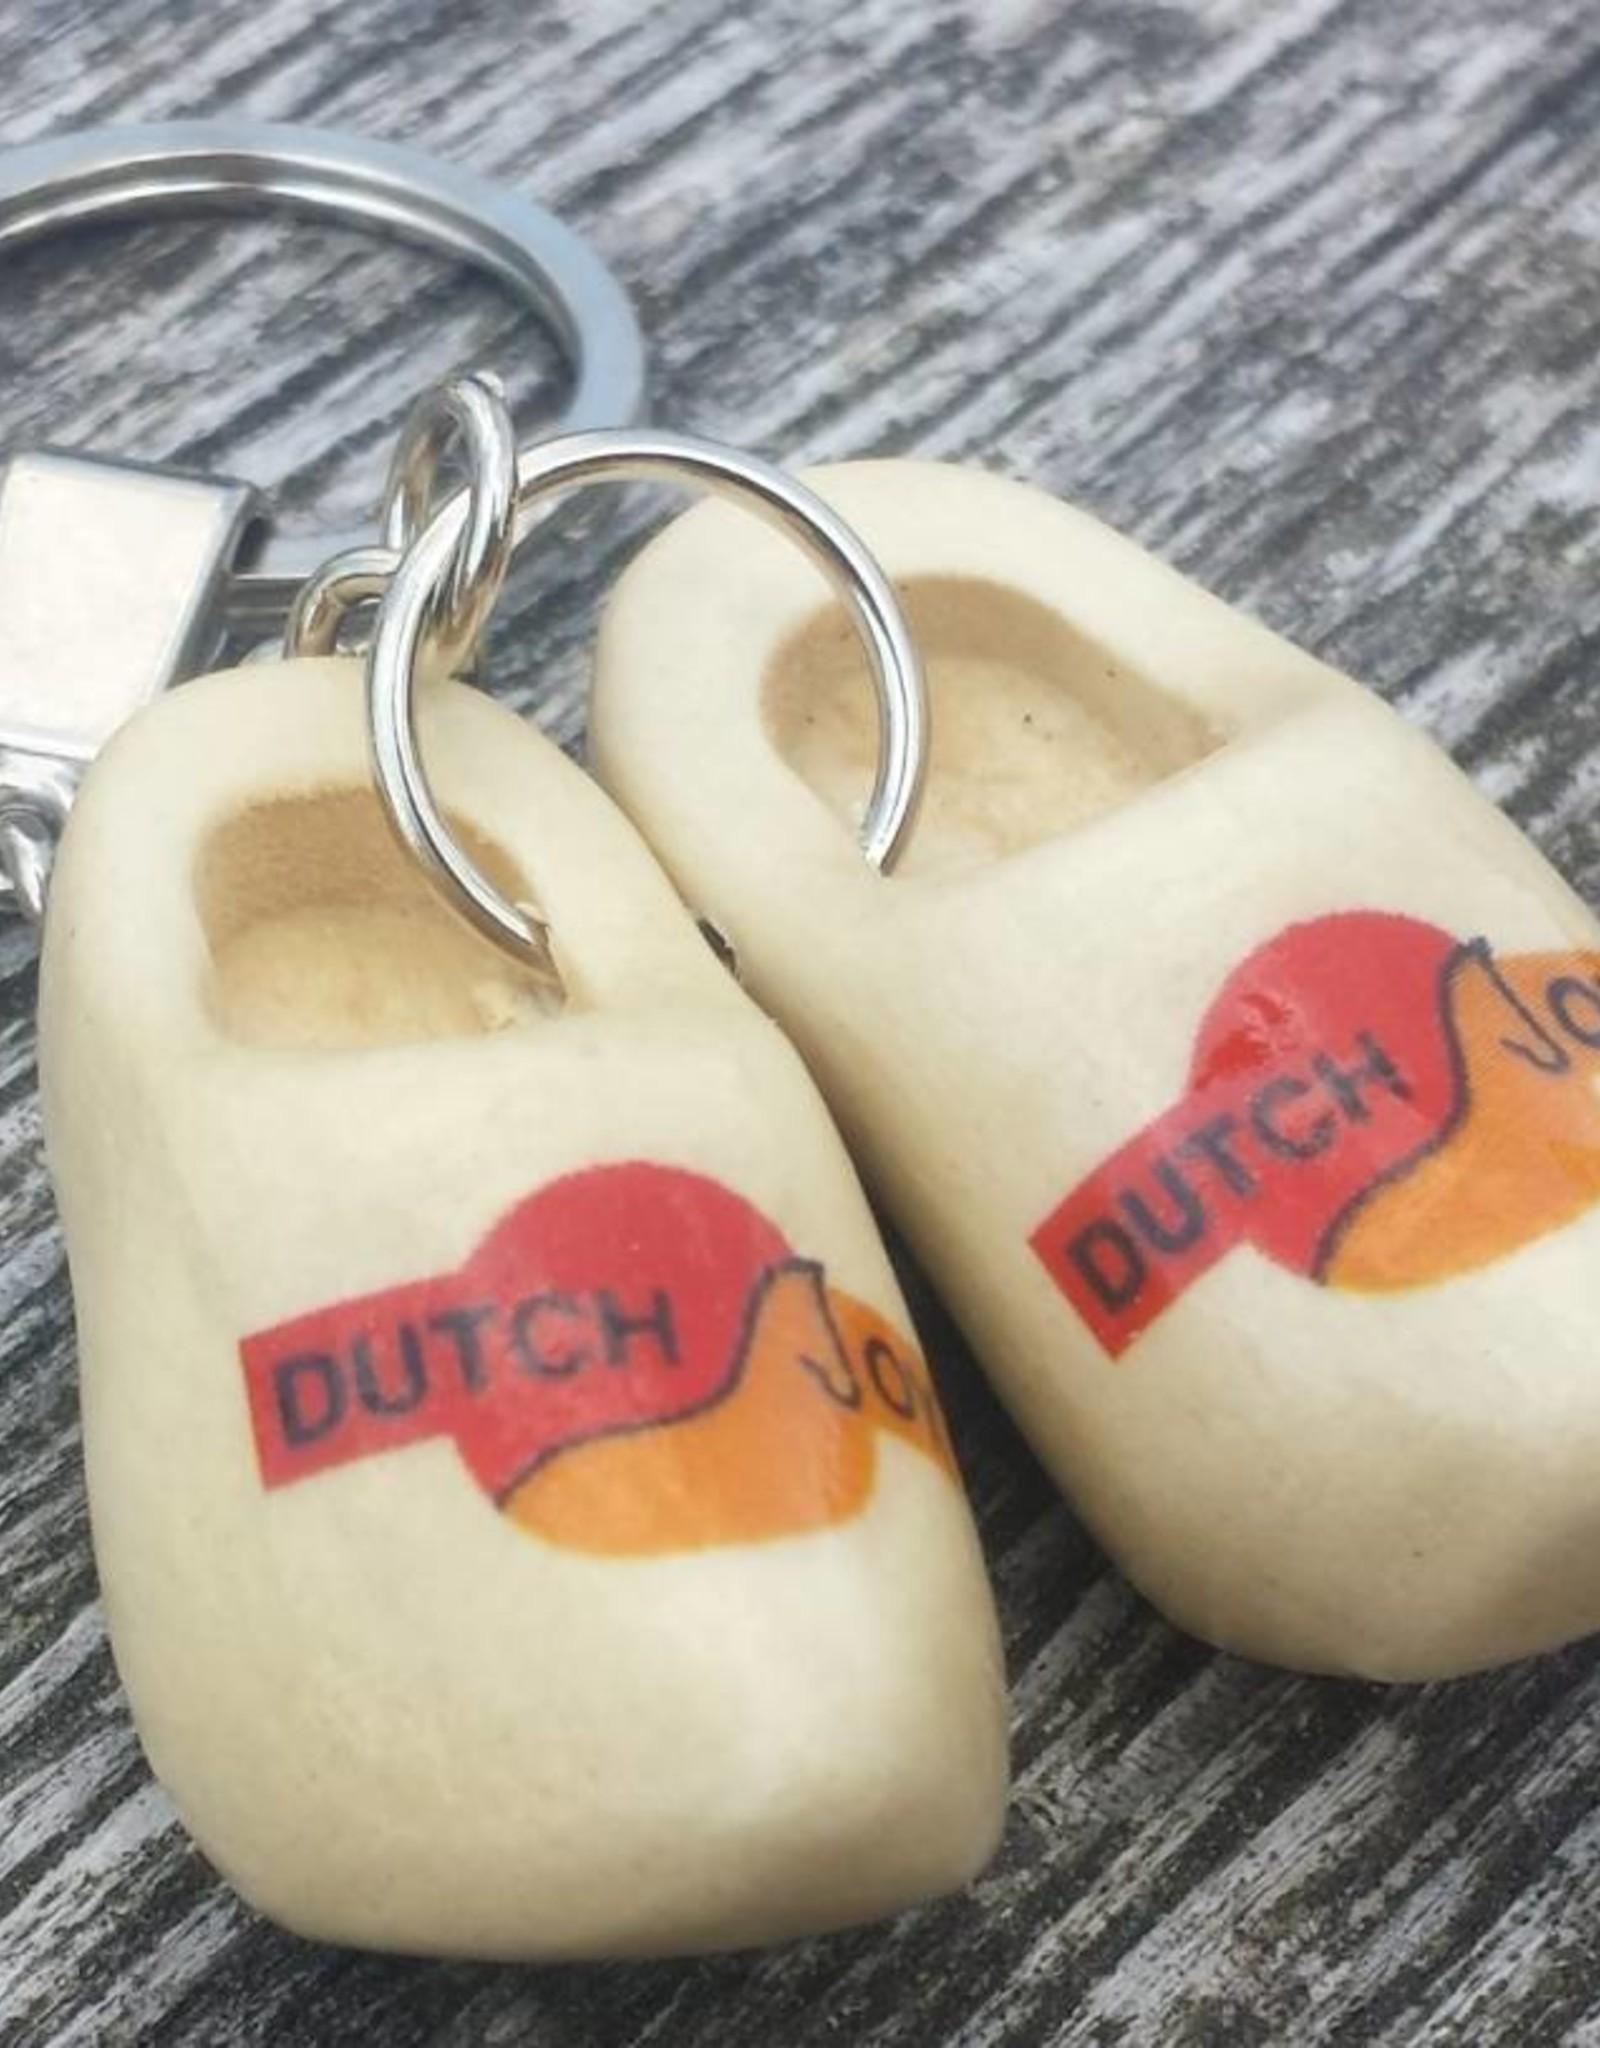 Dubbele Klomp sleutelhangers met logo of tekst